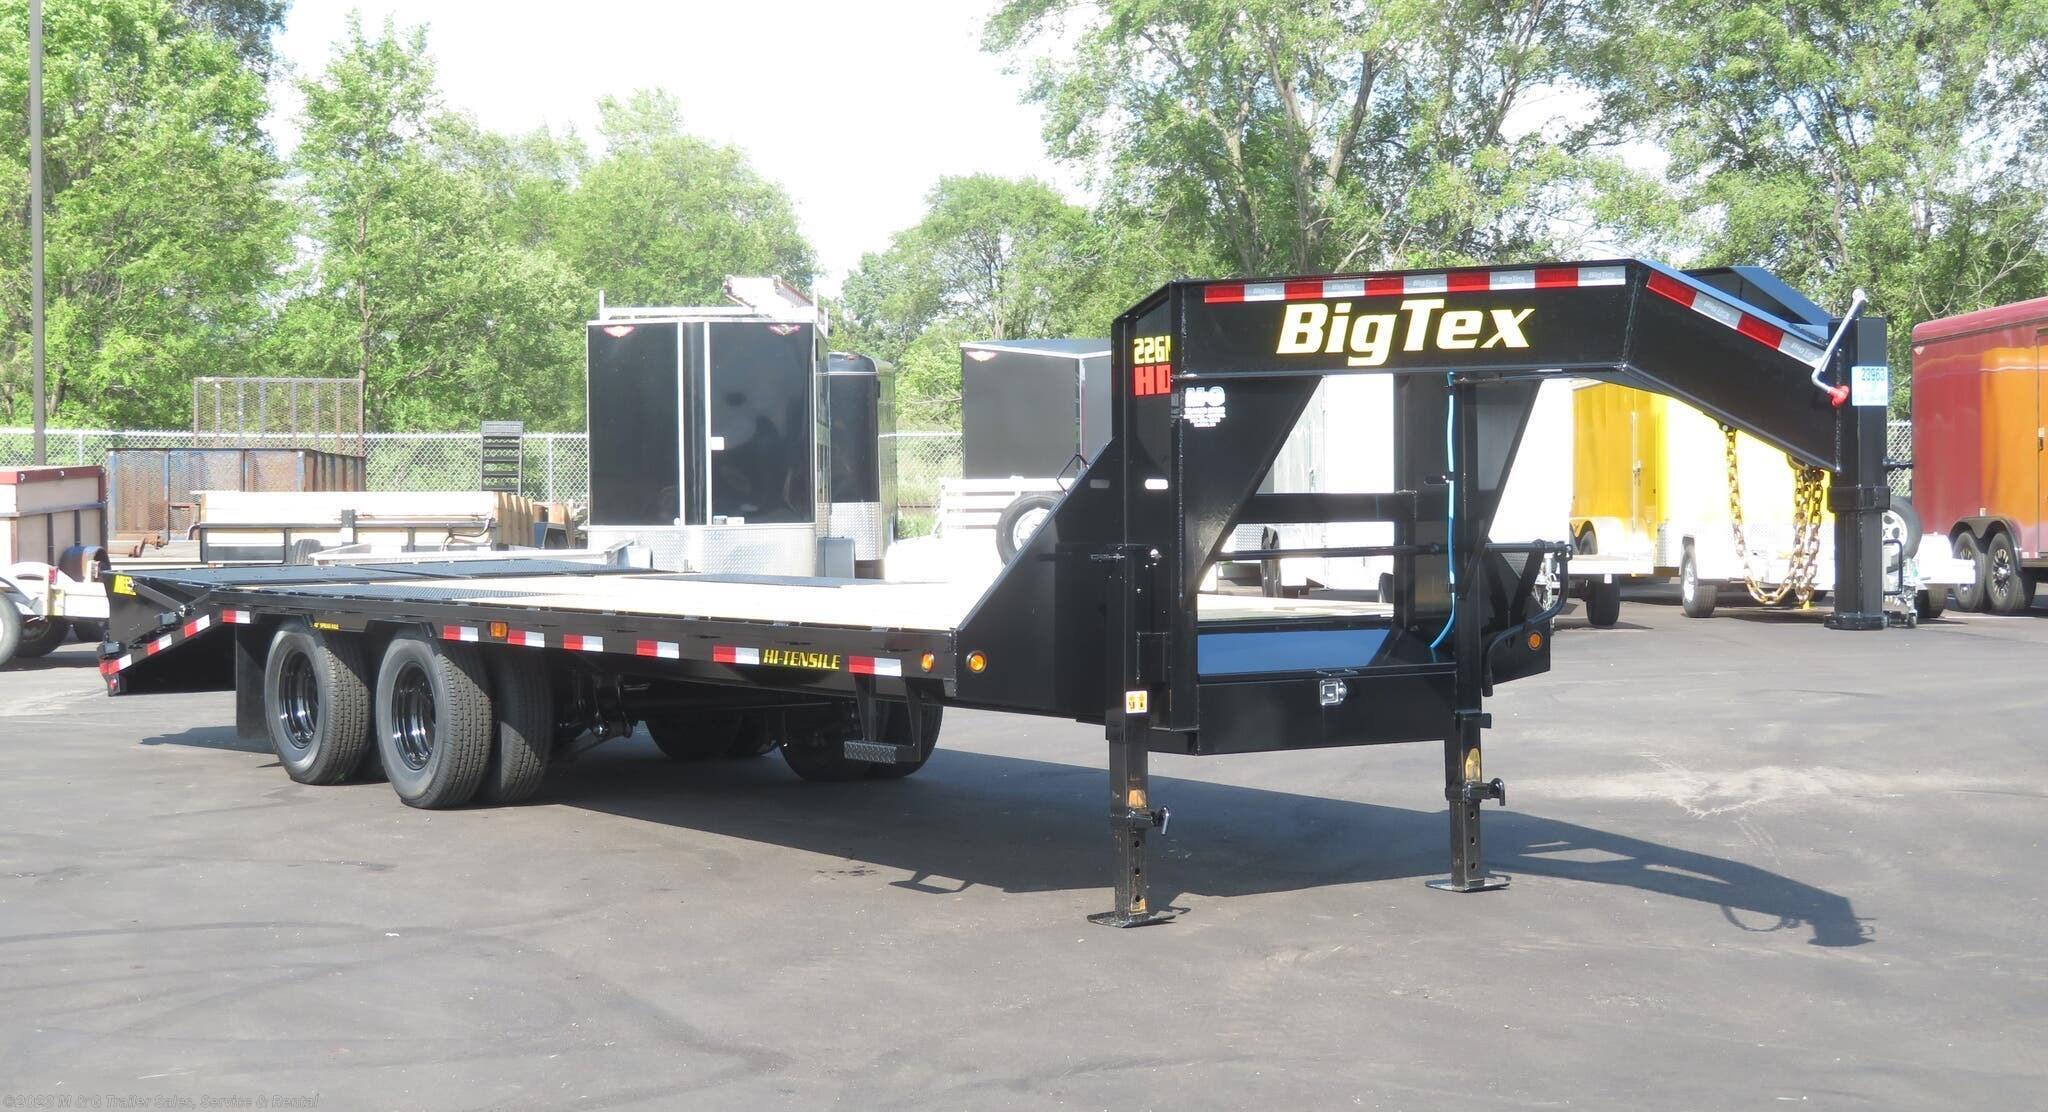 2022 Big Tex 8.5x20+5 Gooseneck Trailer - 23.9K GVWR - Stock #111639